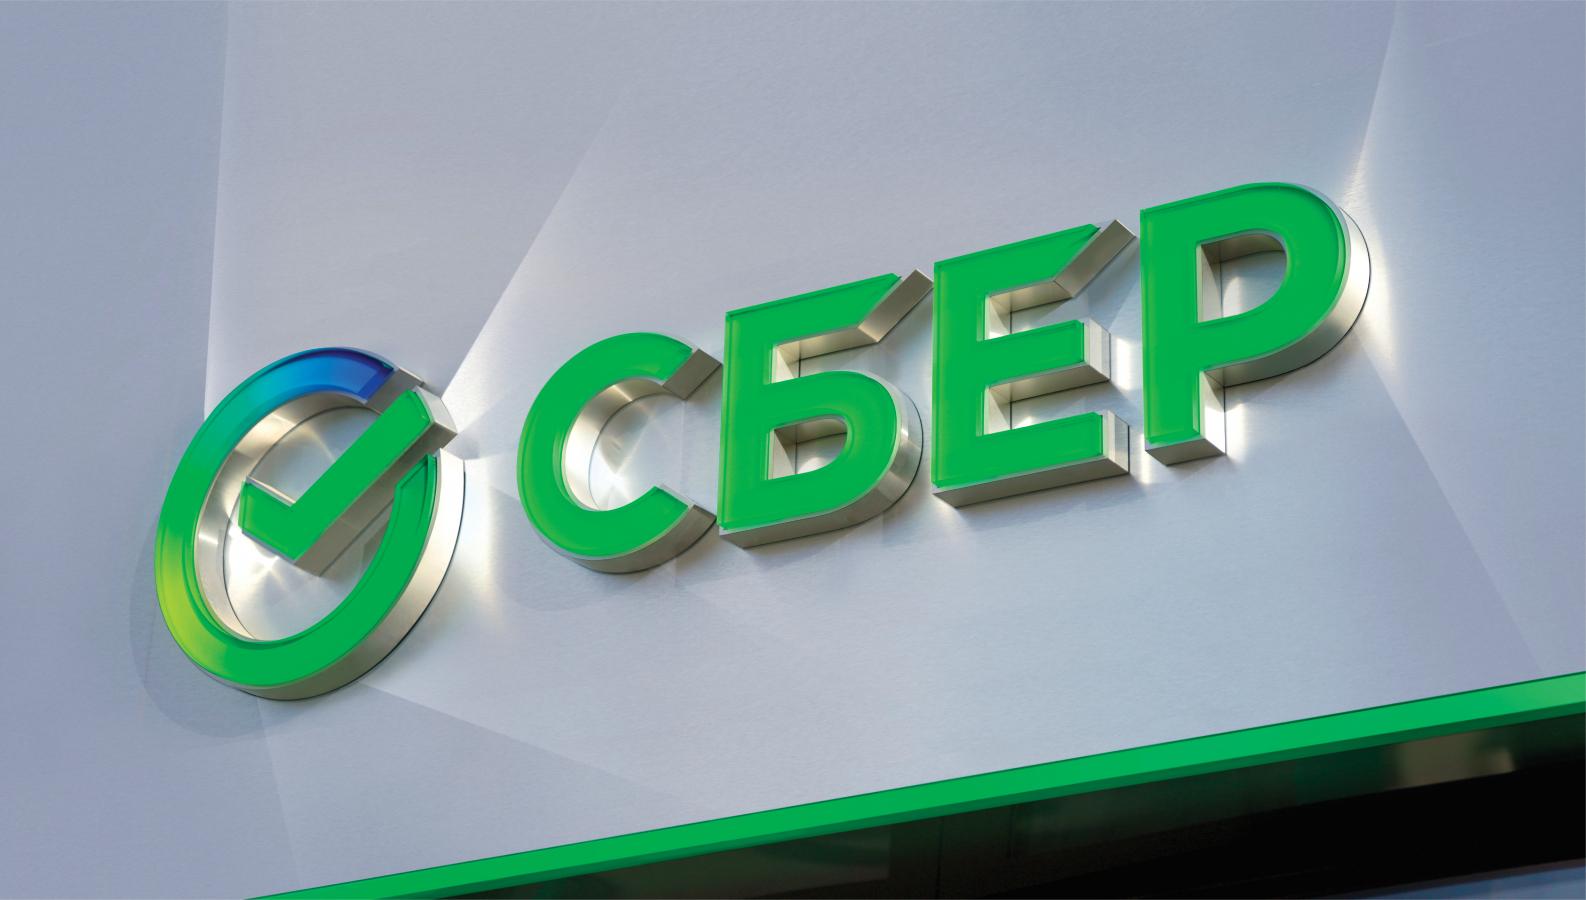 Сбер 金融银行品牌重塑视觉形象vi设计系统-logo设计